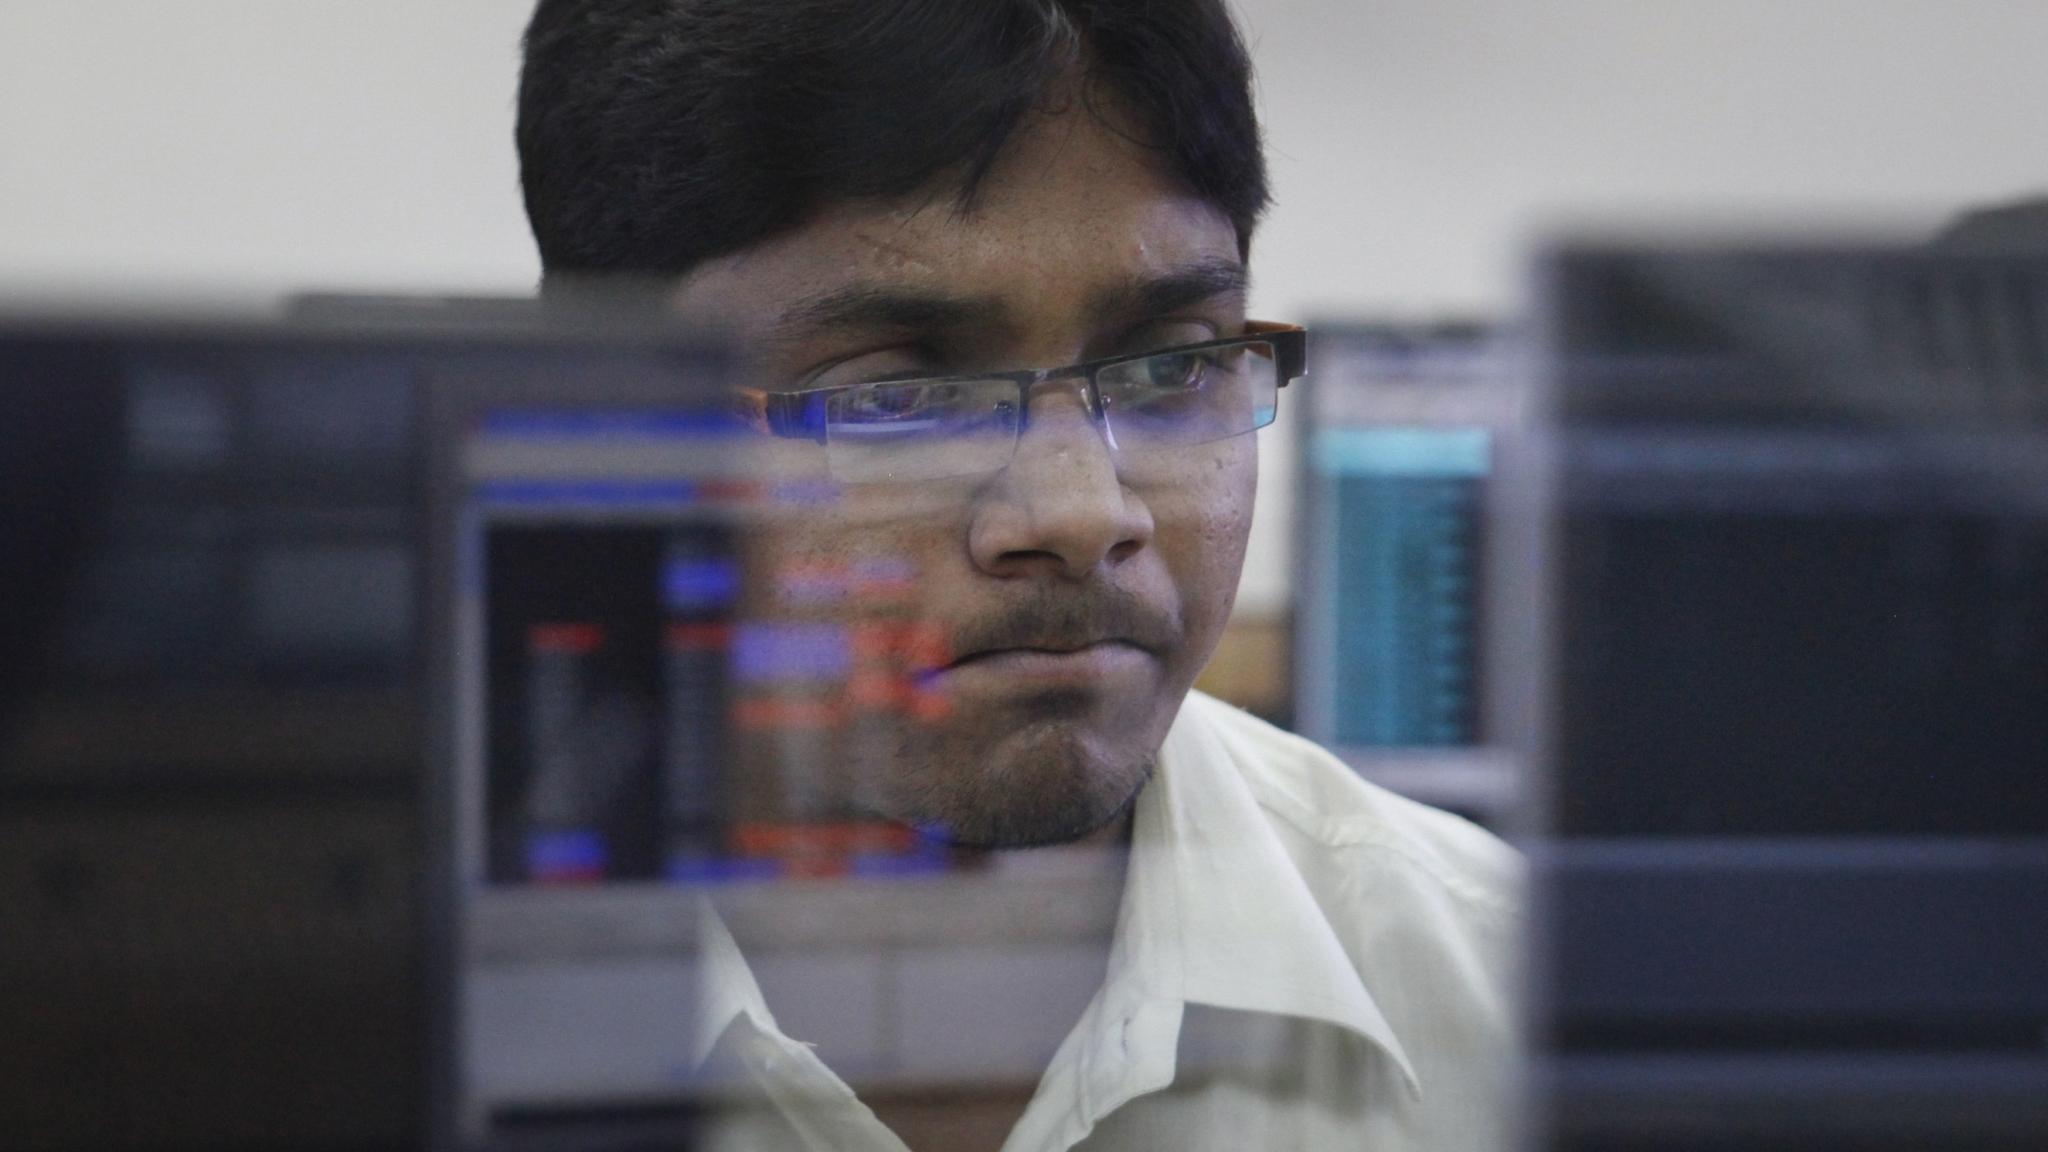 Closing Bell: Sensex Down 300 Points, Nifty Ends Below 11,600